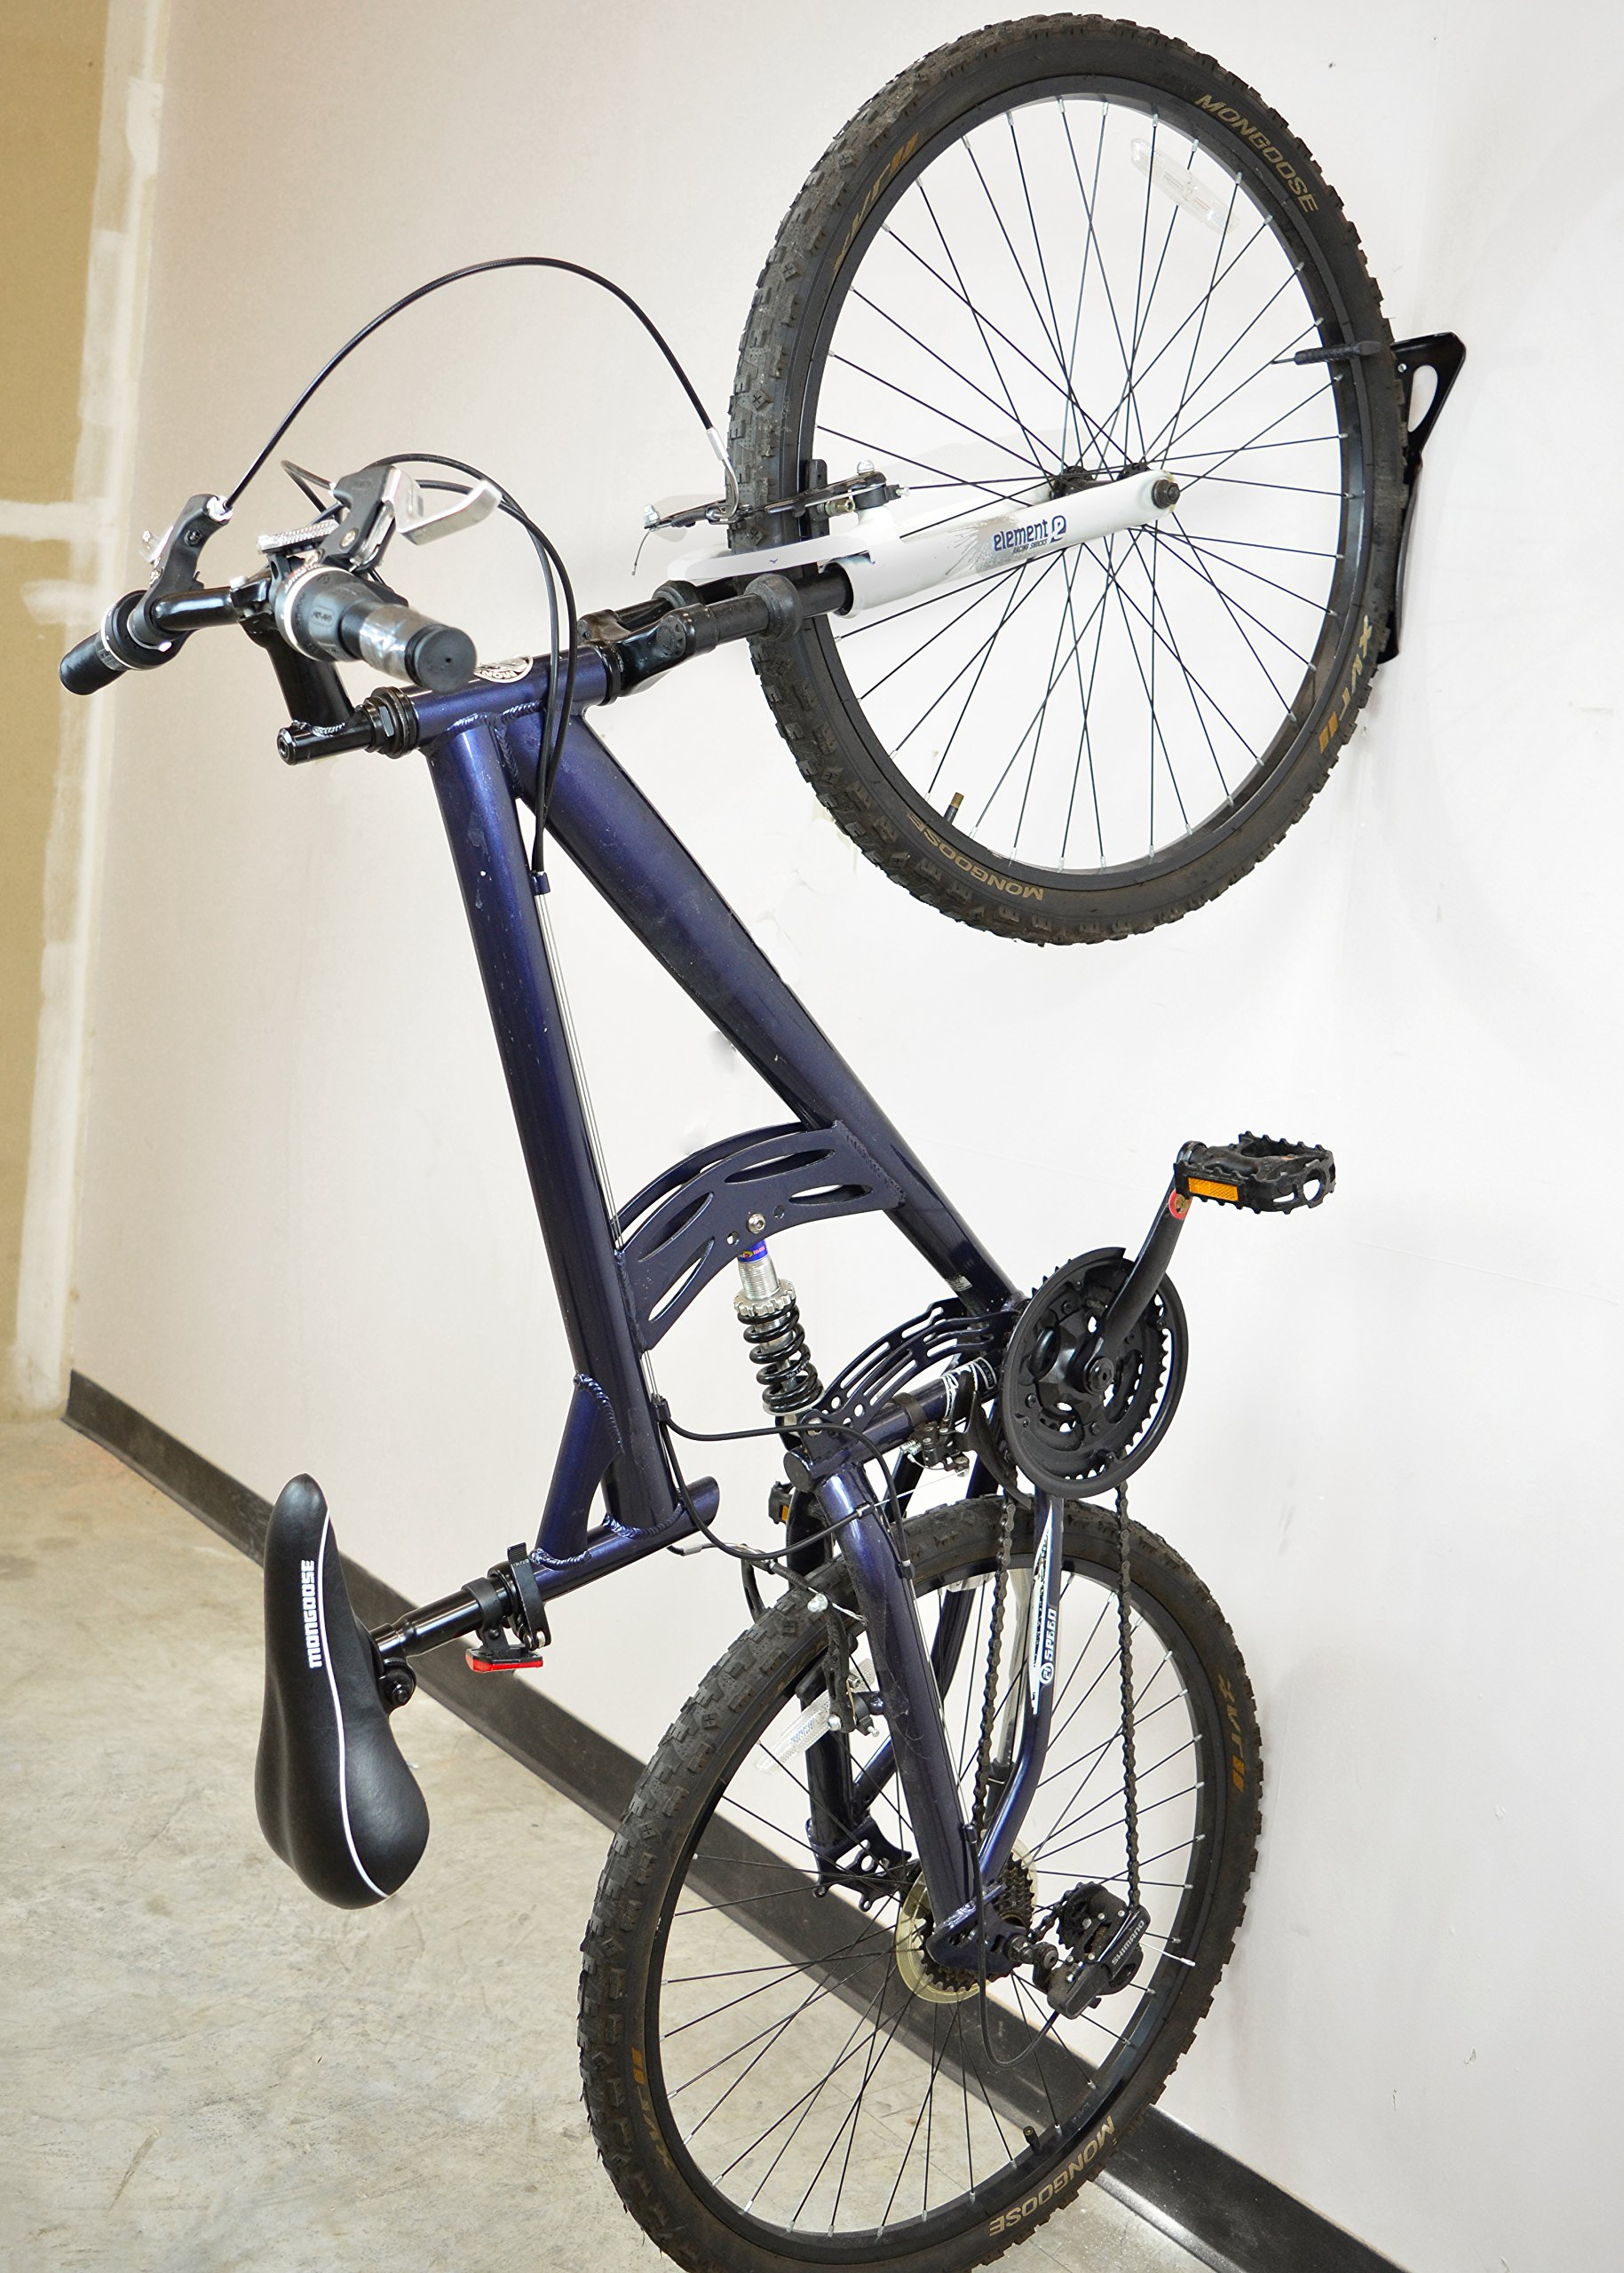 Lumintrail Heavy Duty Bicycle Wall Hanger Vertical Bike Storage Rack by Lumintrail (Image #5)